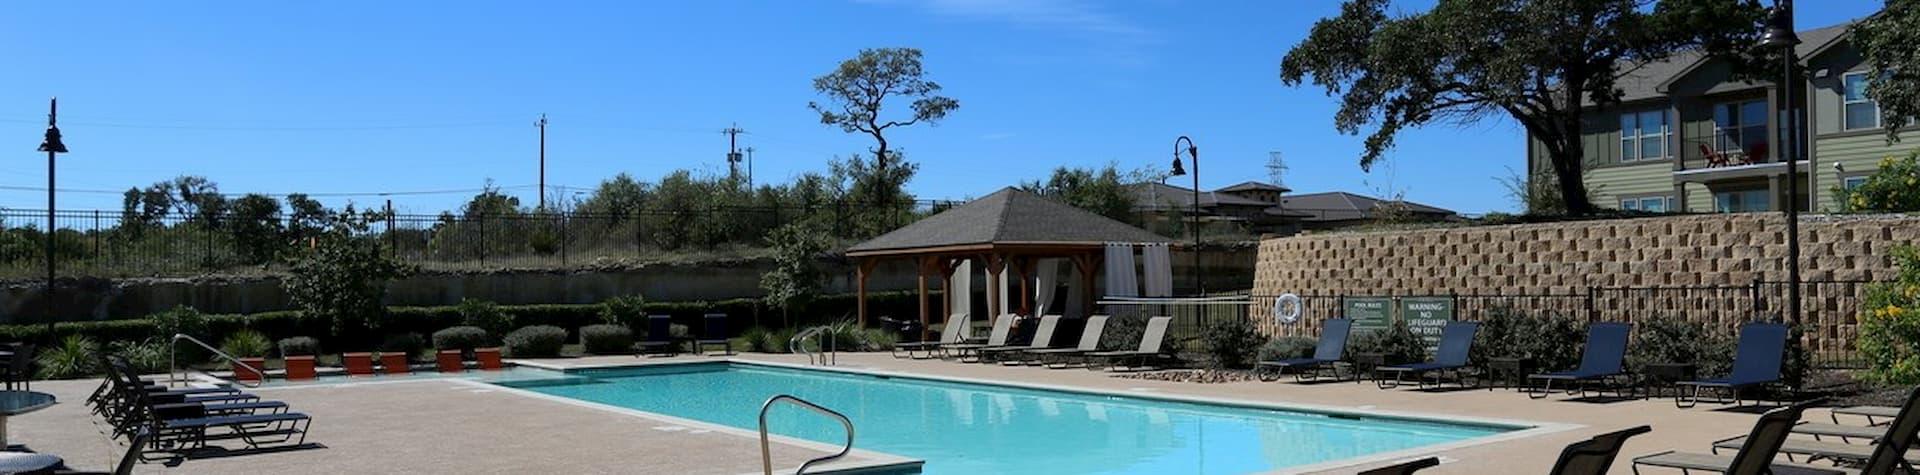 springs-at-alamo-ranch-apartments-san-antonio-tx-pool (1)